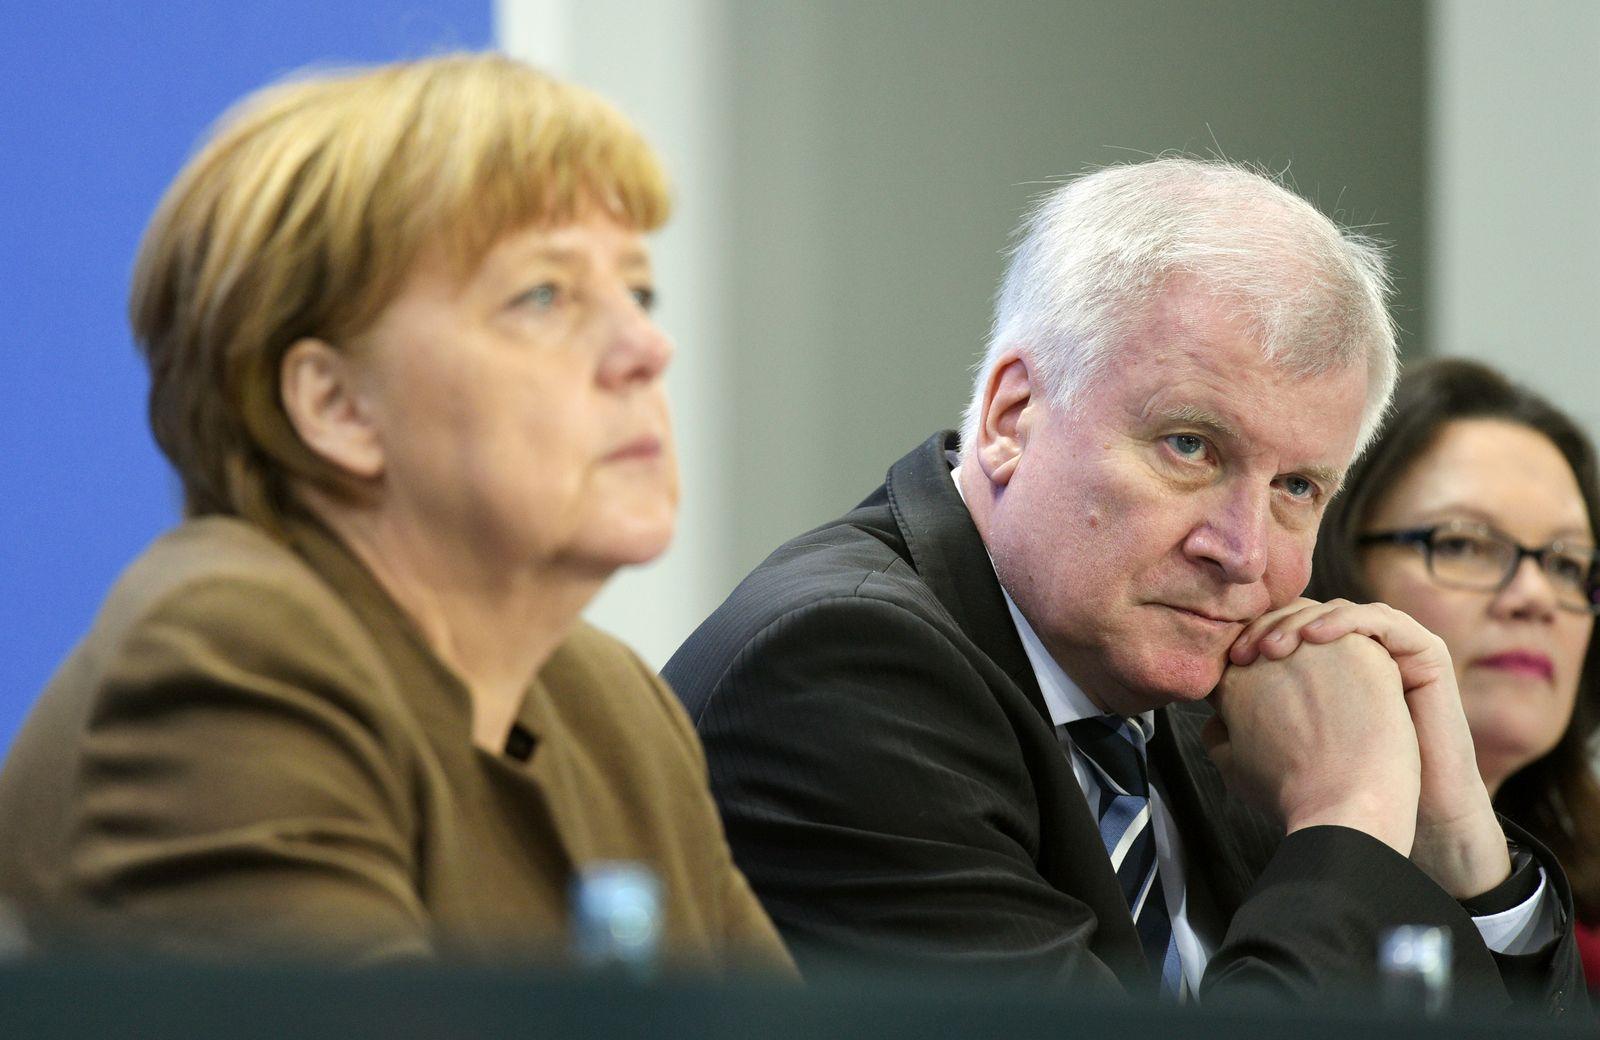 Zeitleiste/ CSU/ CDU/ Seehofer/ Mai 2016